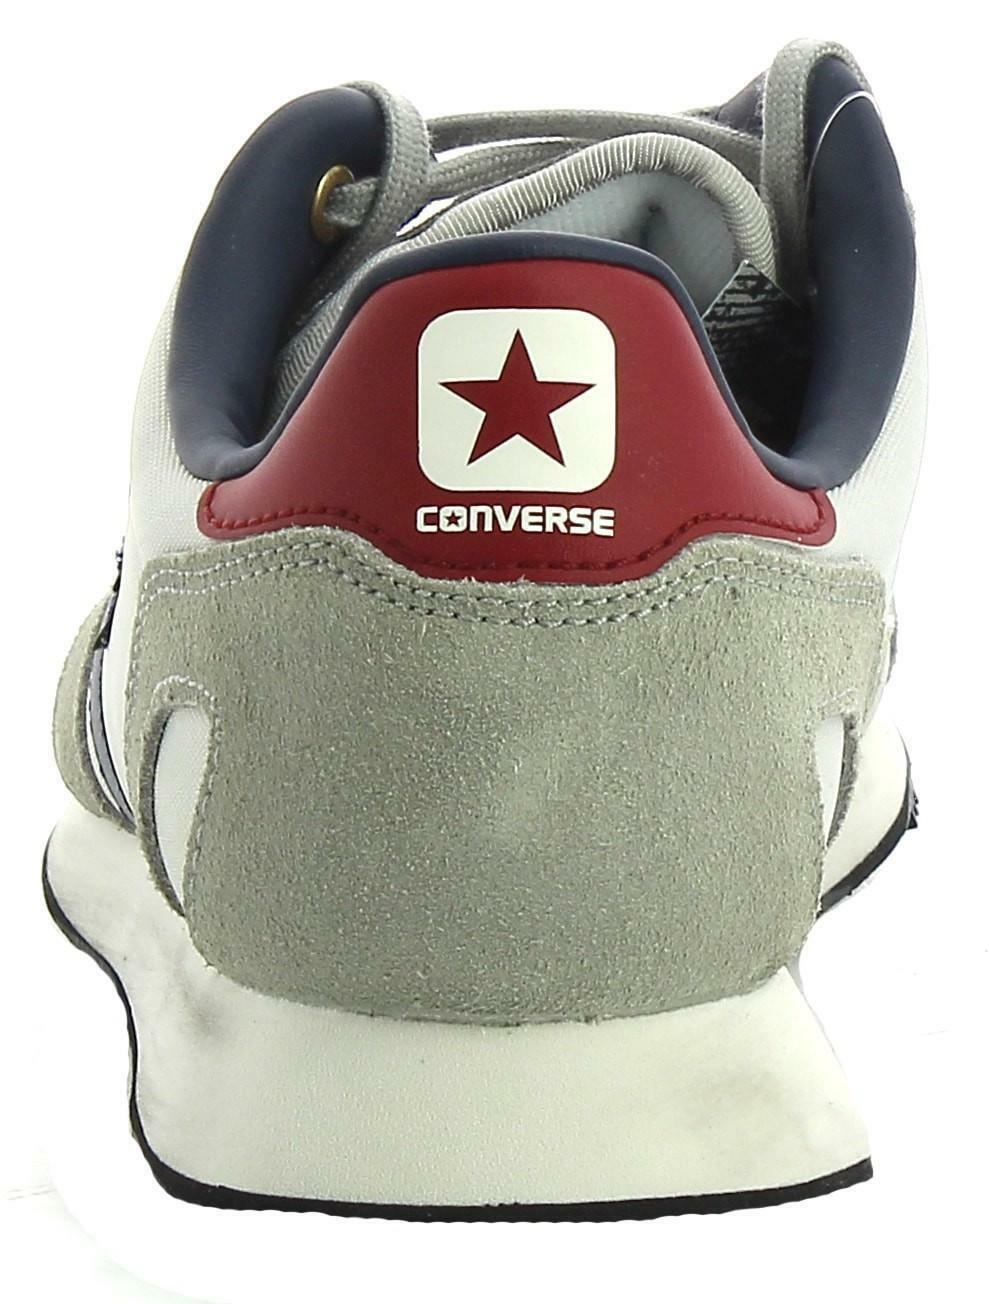 converse converse auckland racer distressed ox scarpe sportive uomo grigie